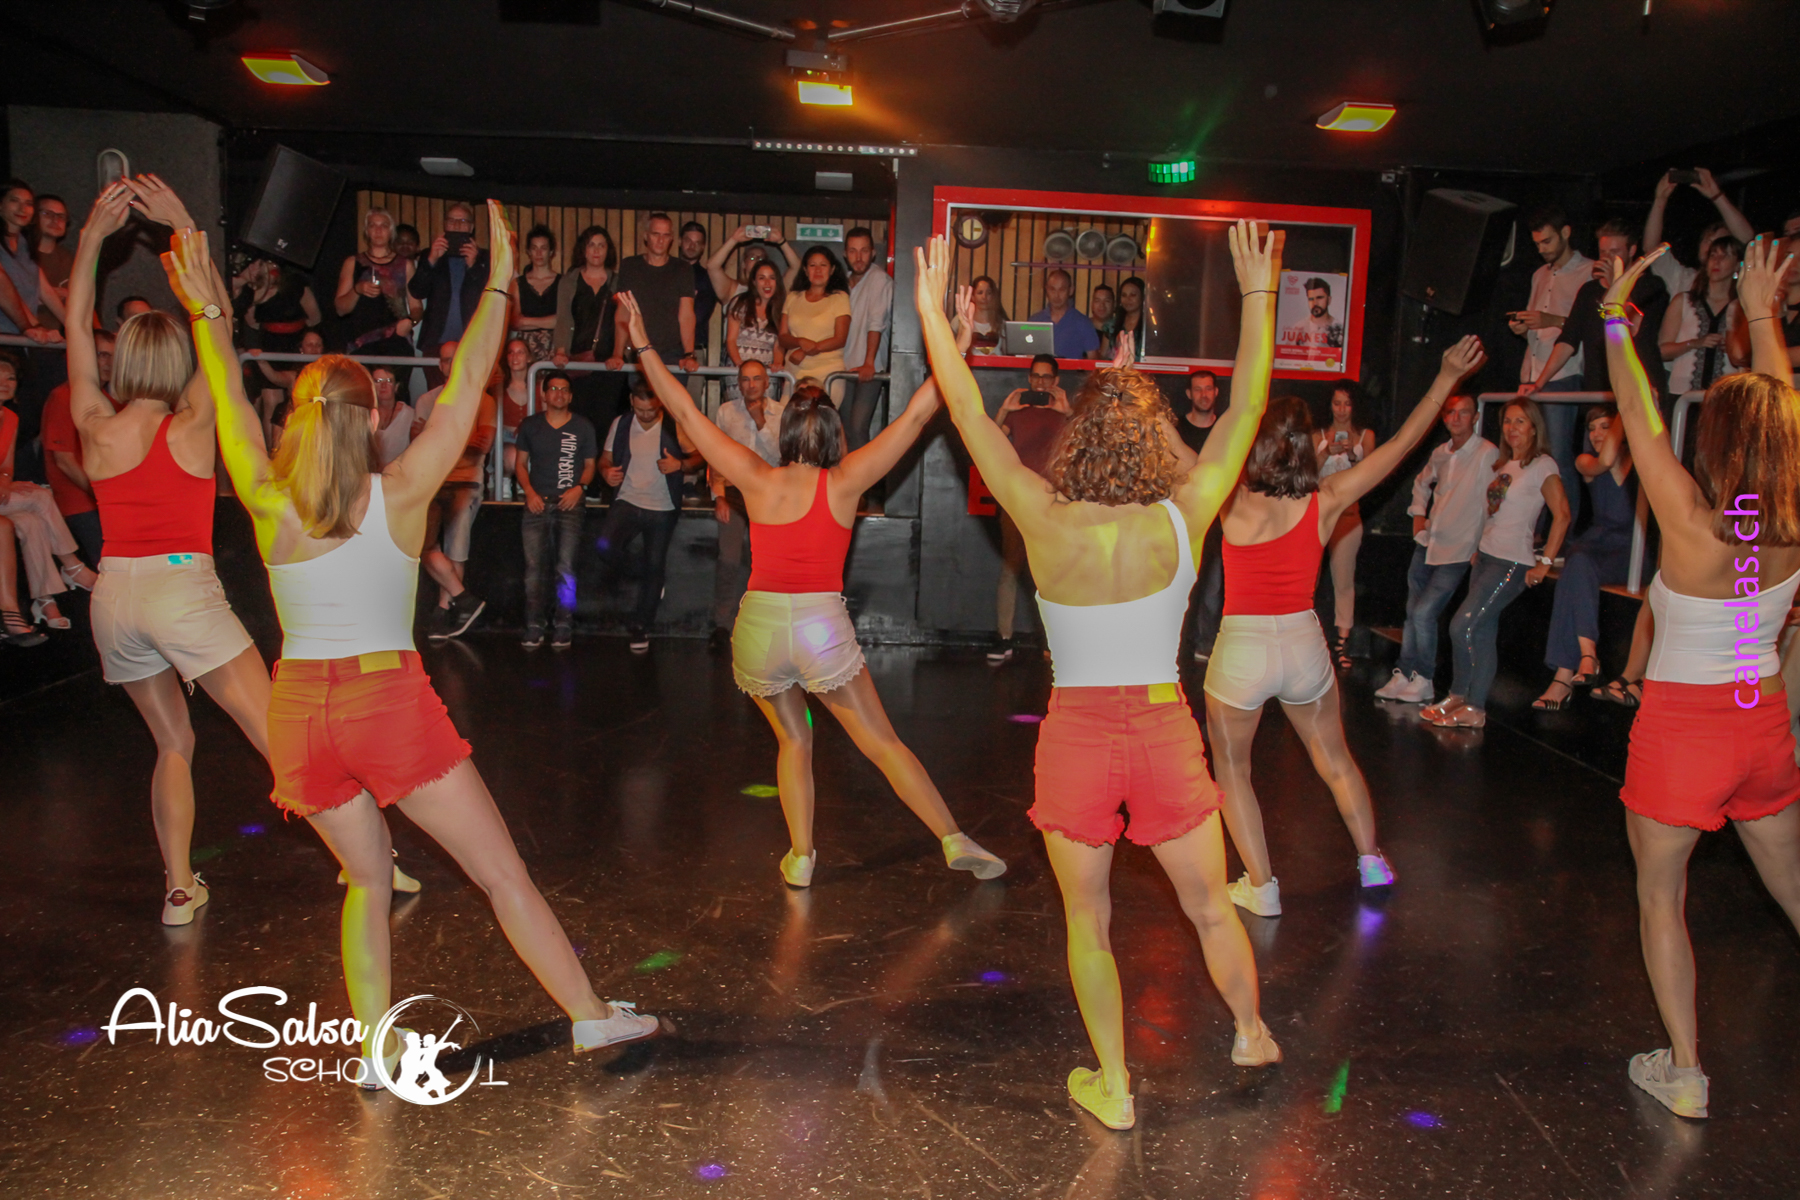 AliaSalsa ecole de danse lausanne soiree bachata salsa cubaineAlia Salsa Soireé Salsa - Bachata-17